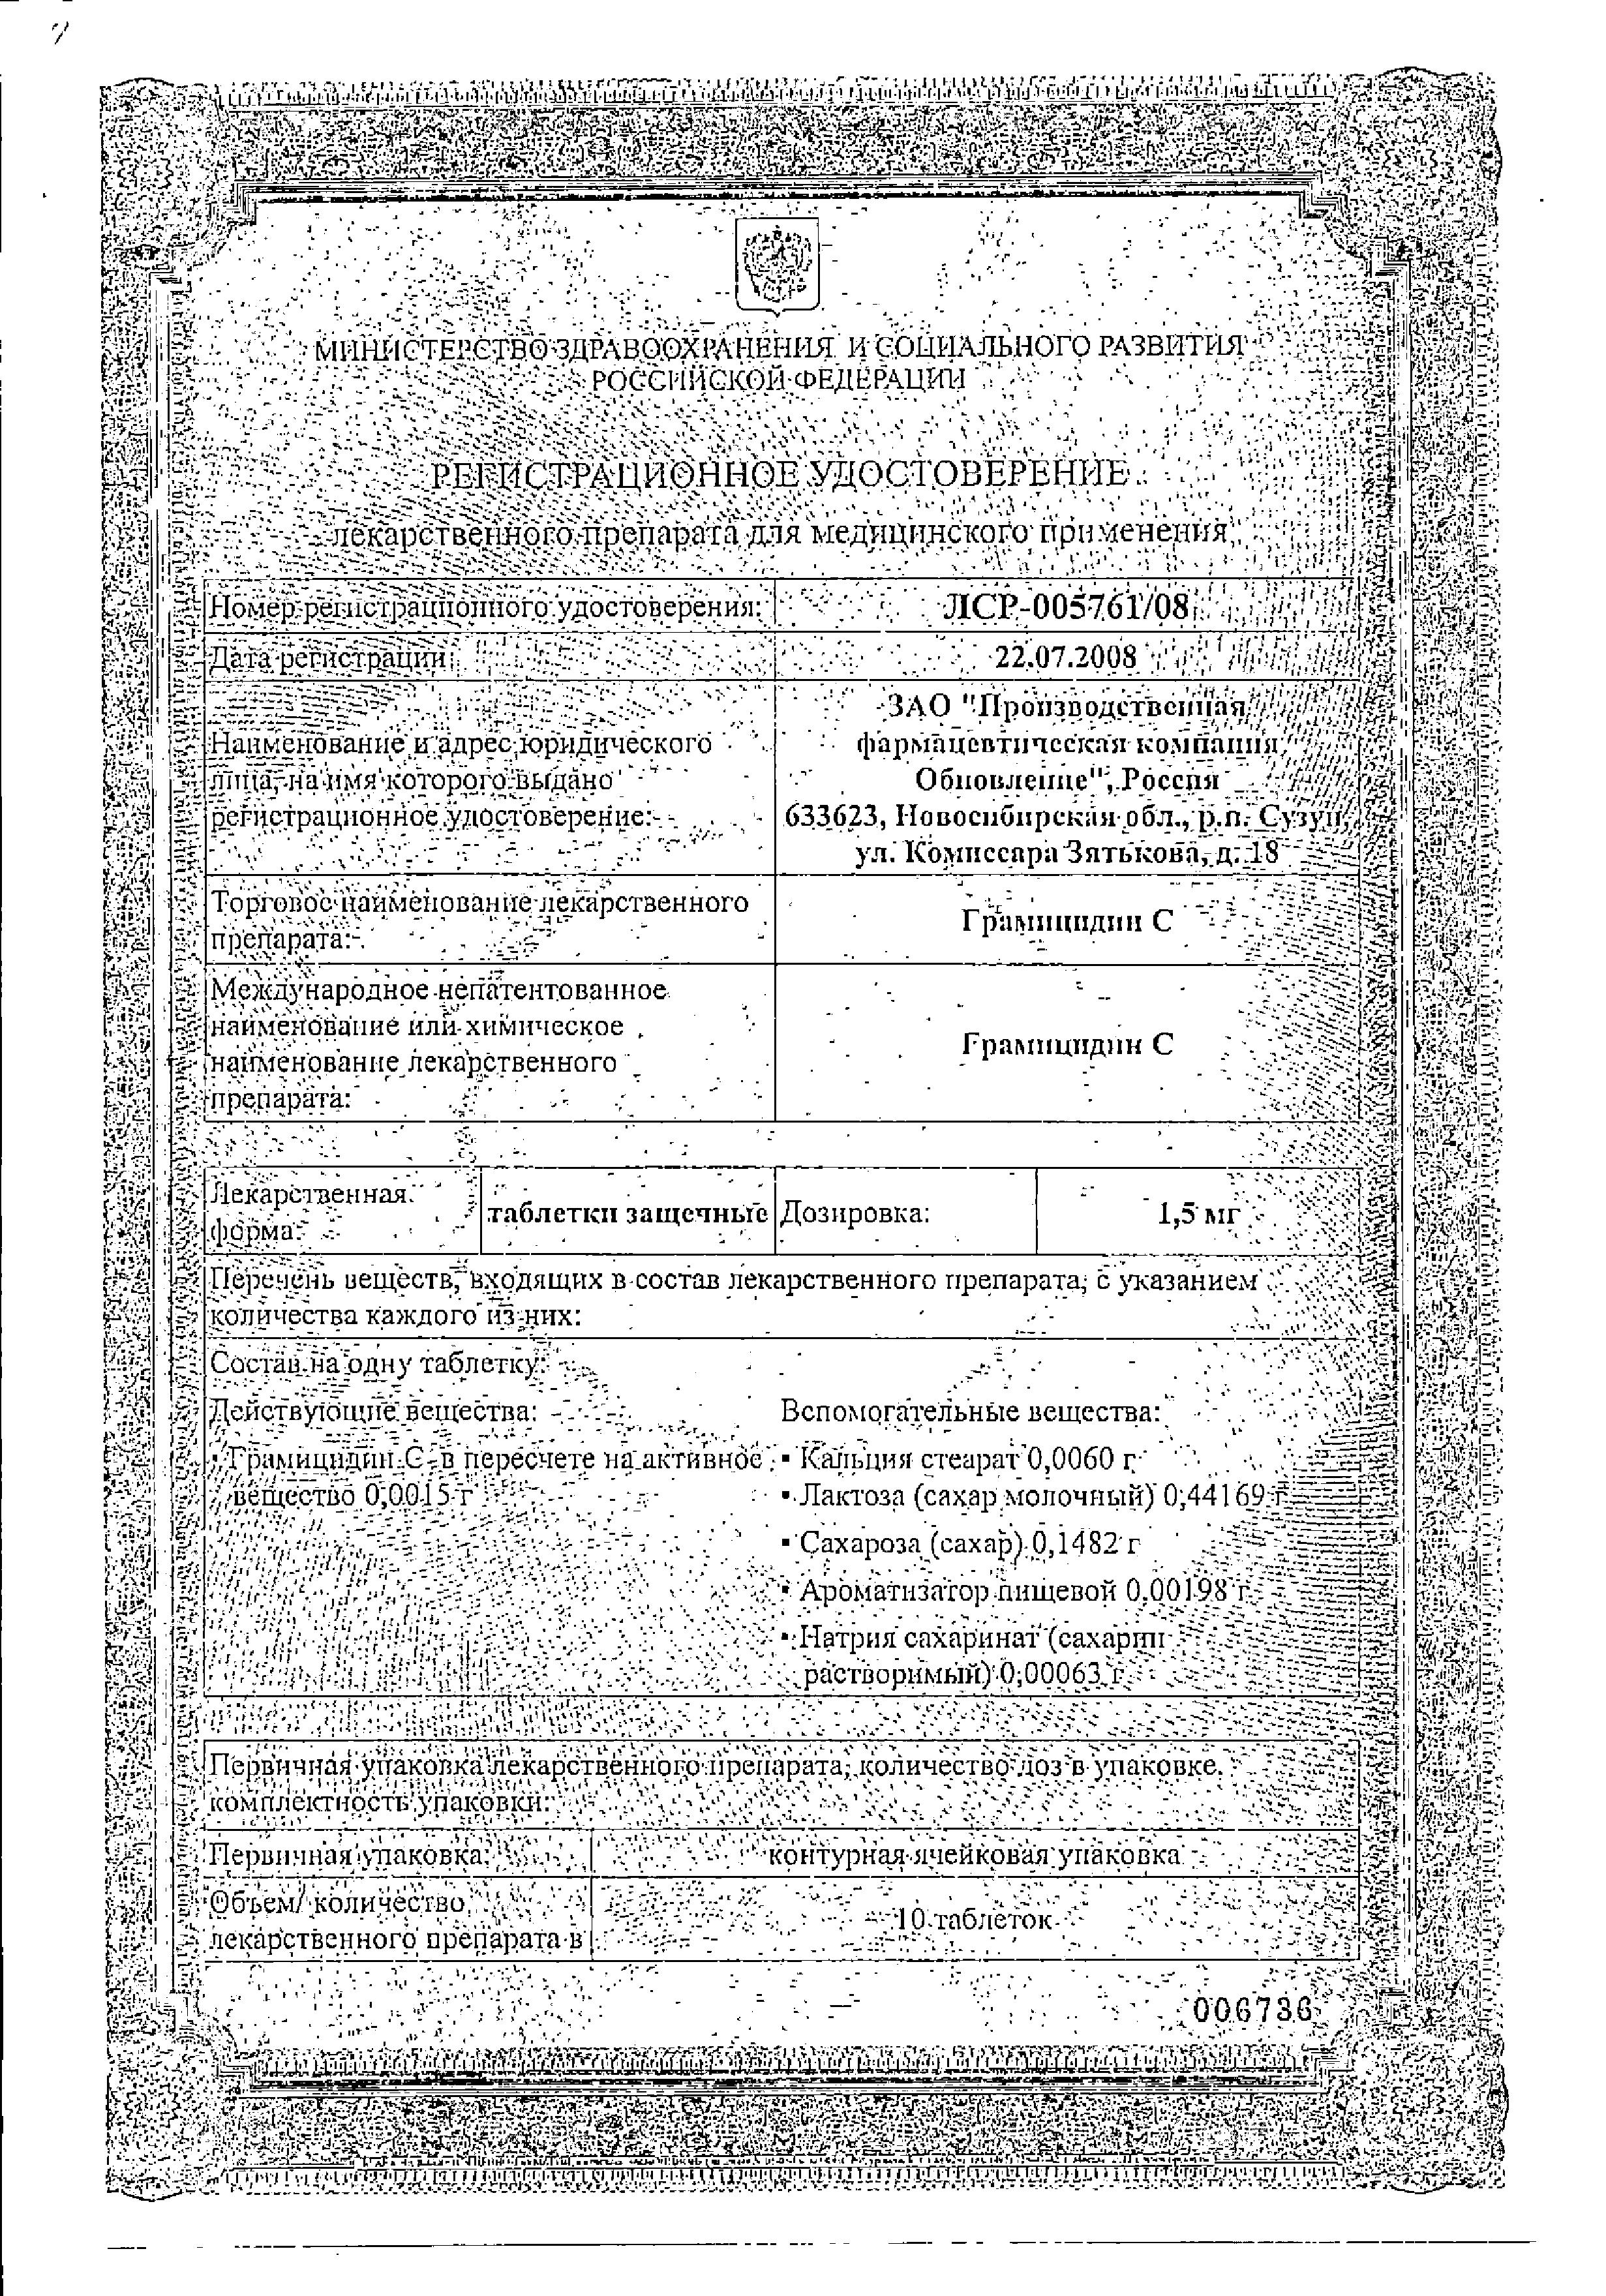 Грамицидин С сертификат